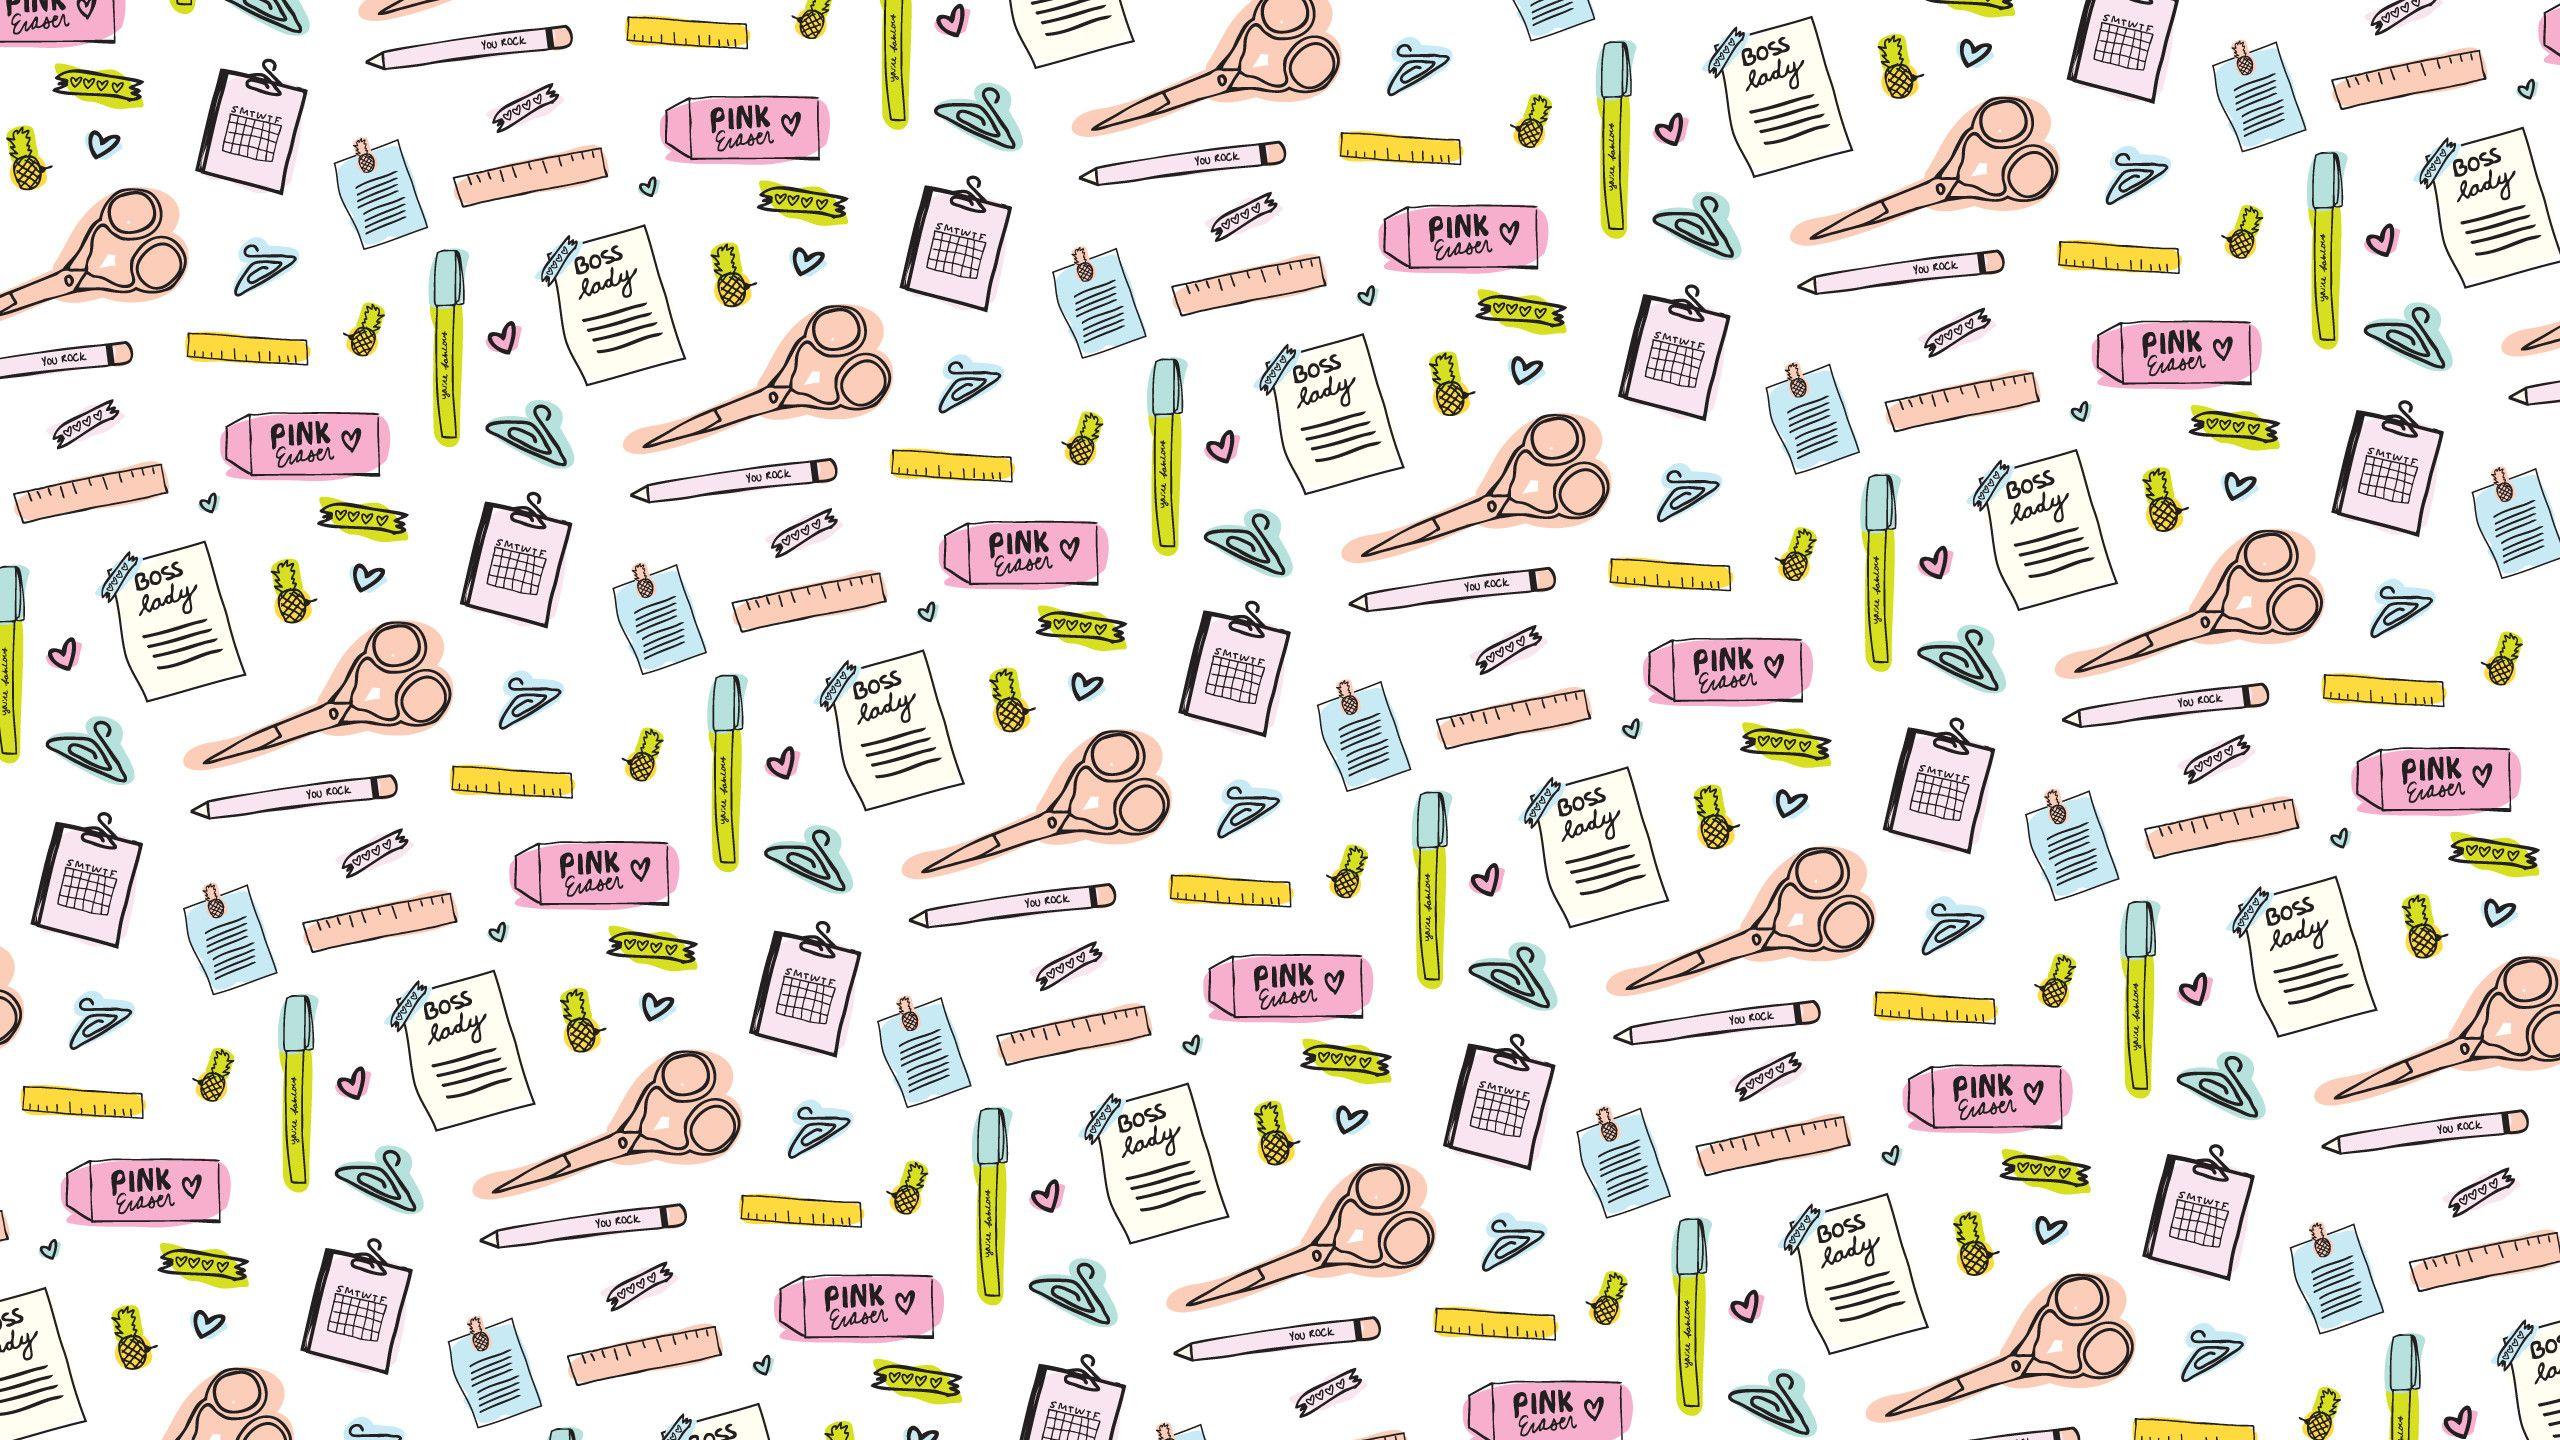 Cute School Desktop Wallpapers   Top Cute School Desktop 2560x1440